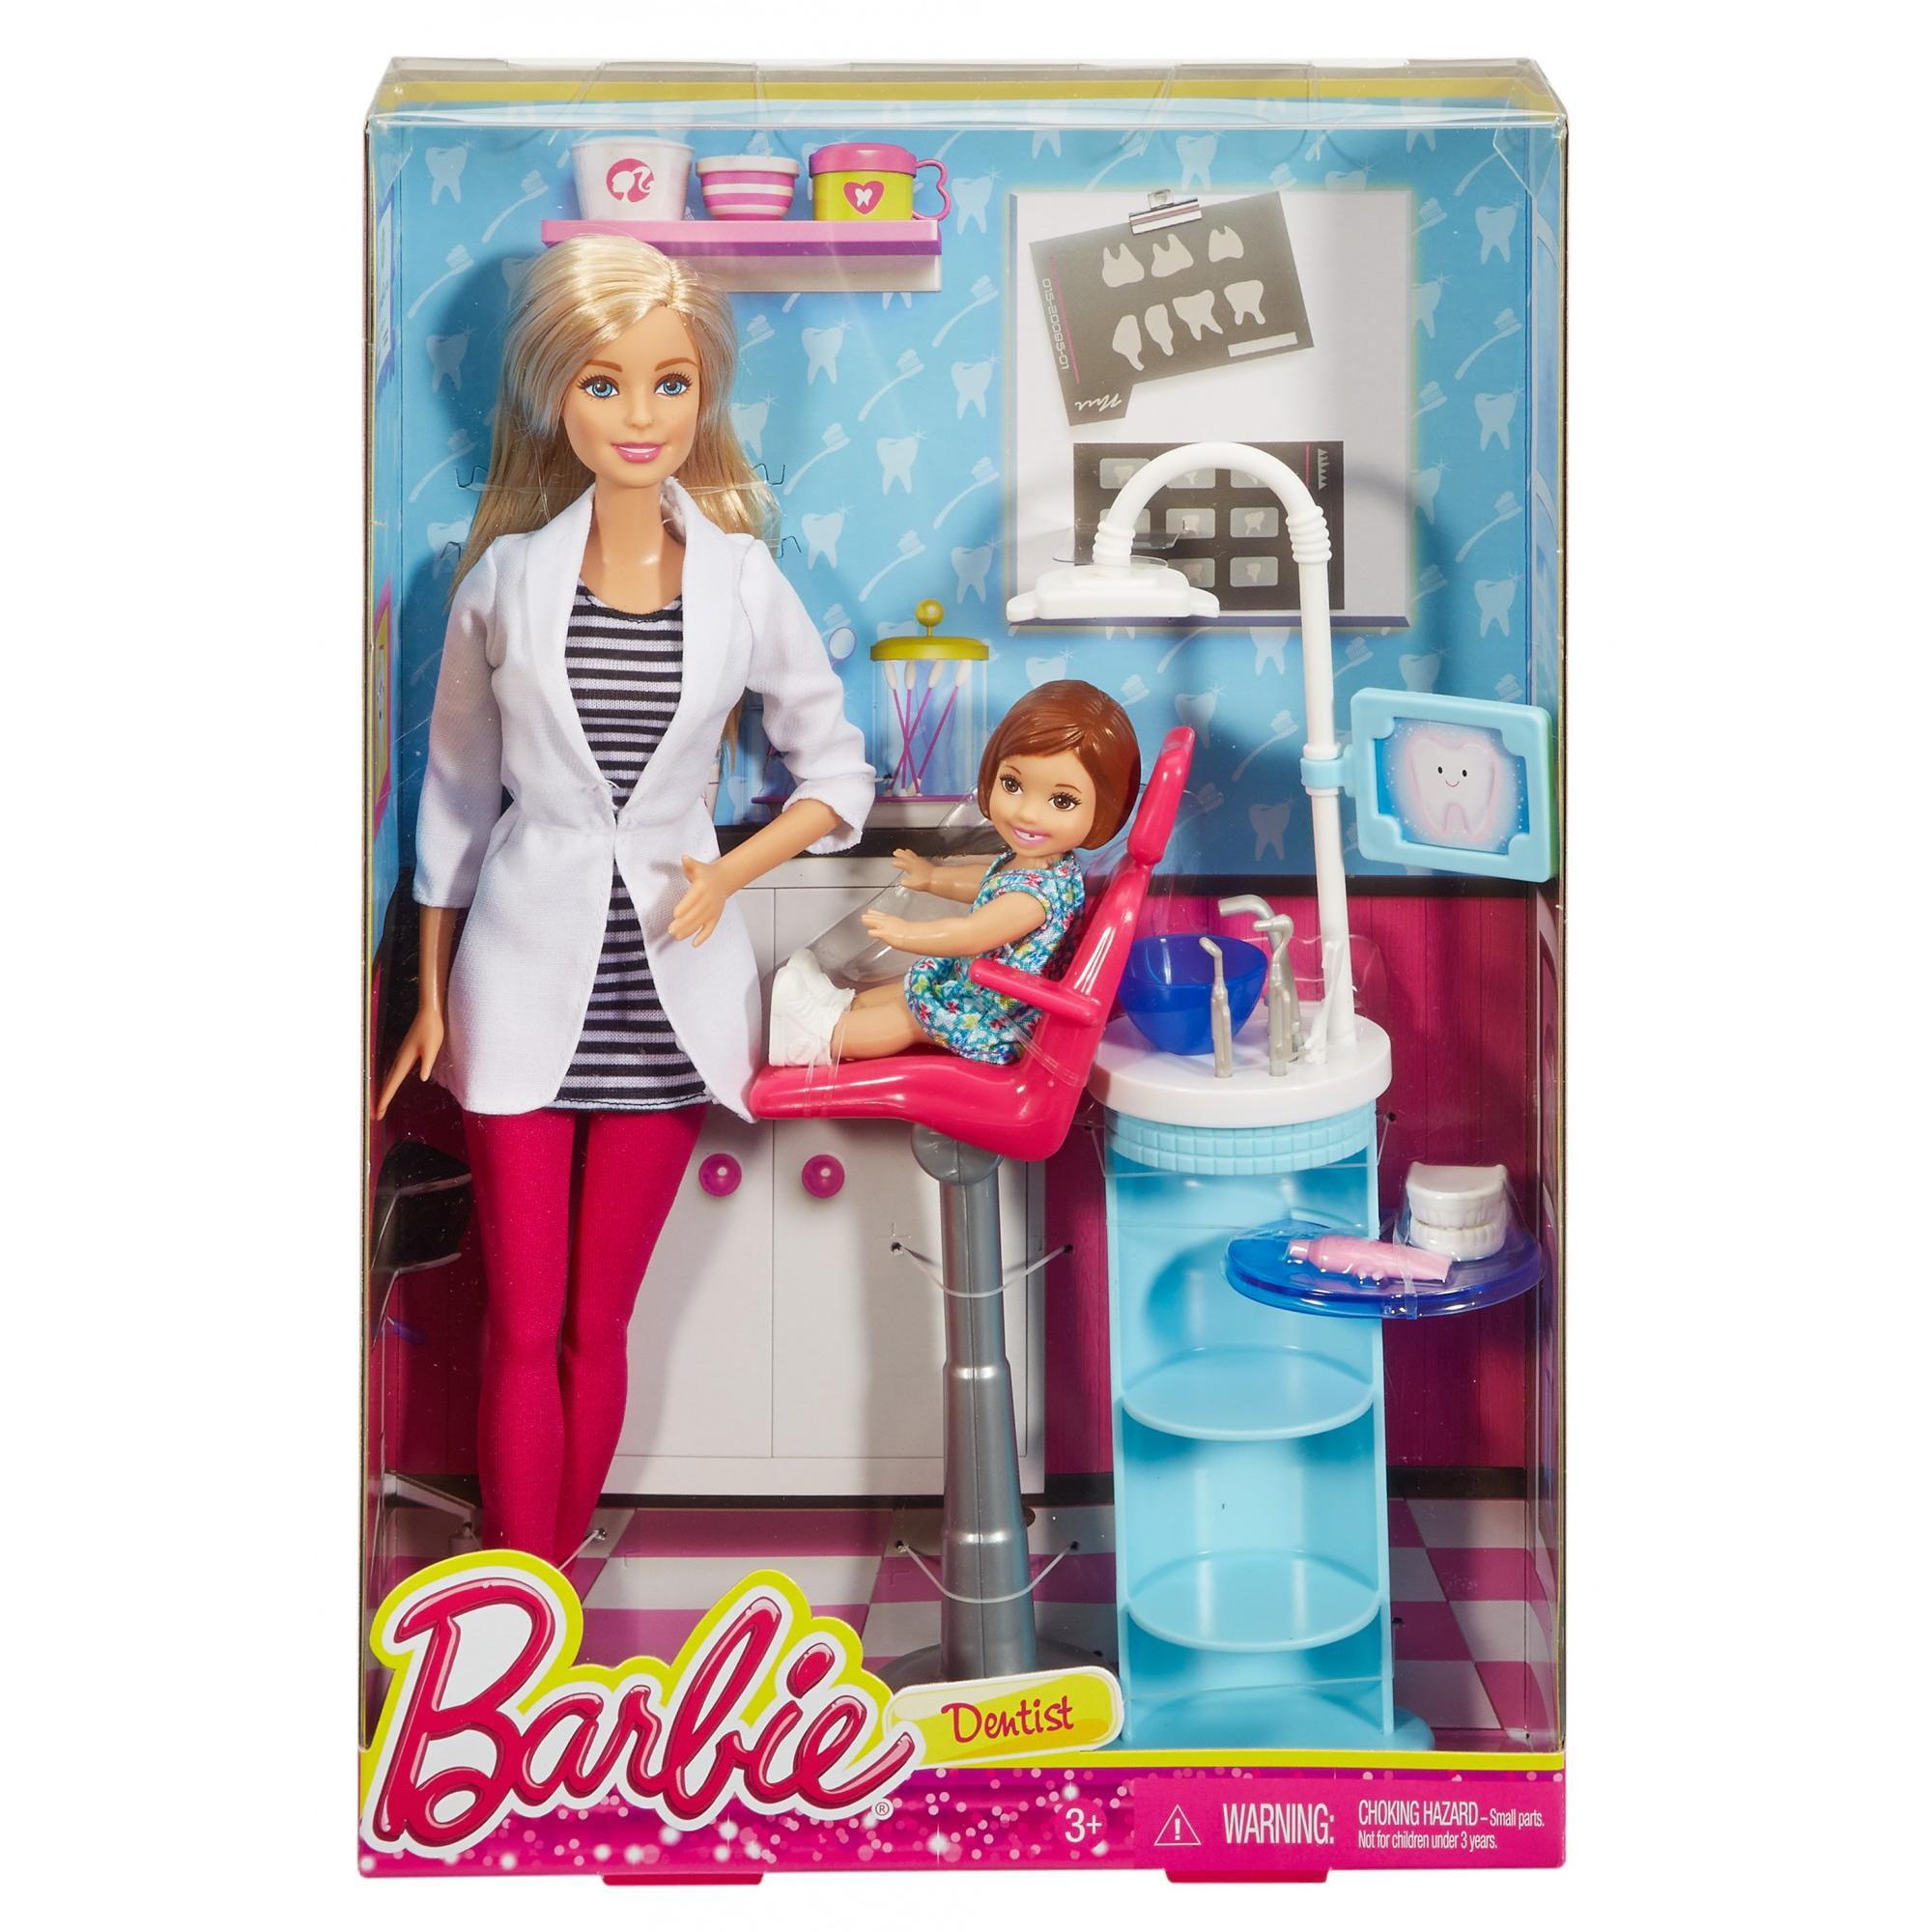 Barbie Careers Dentist Playset - Walmart.com - Walmart.com